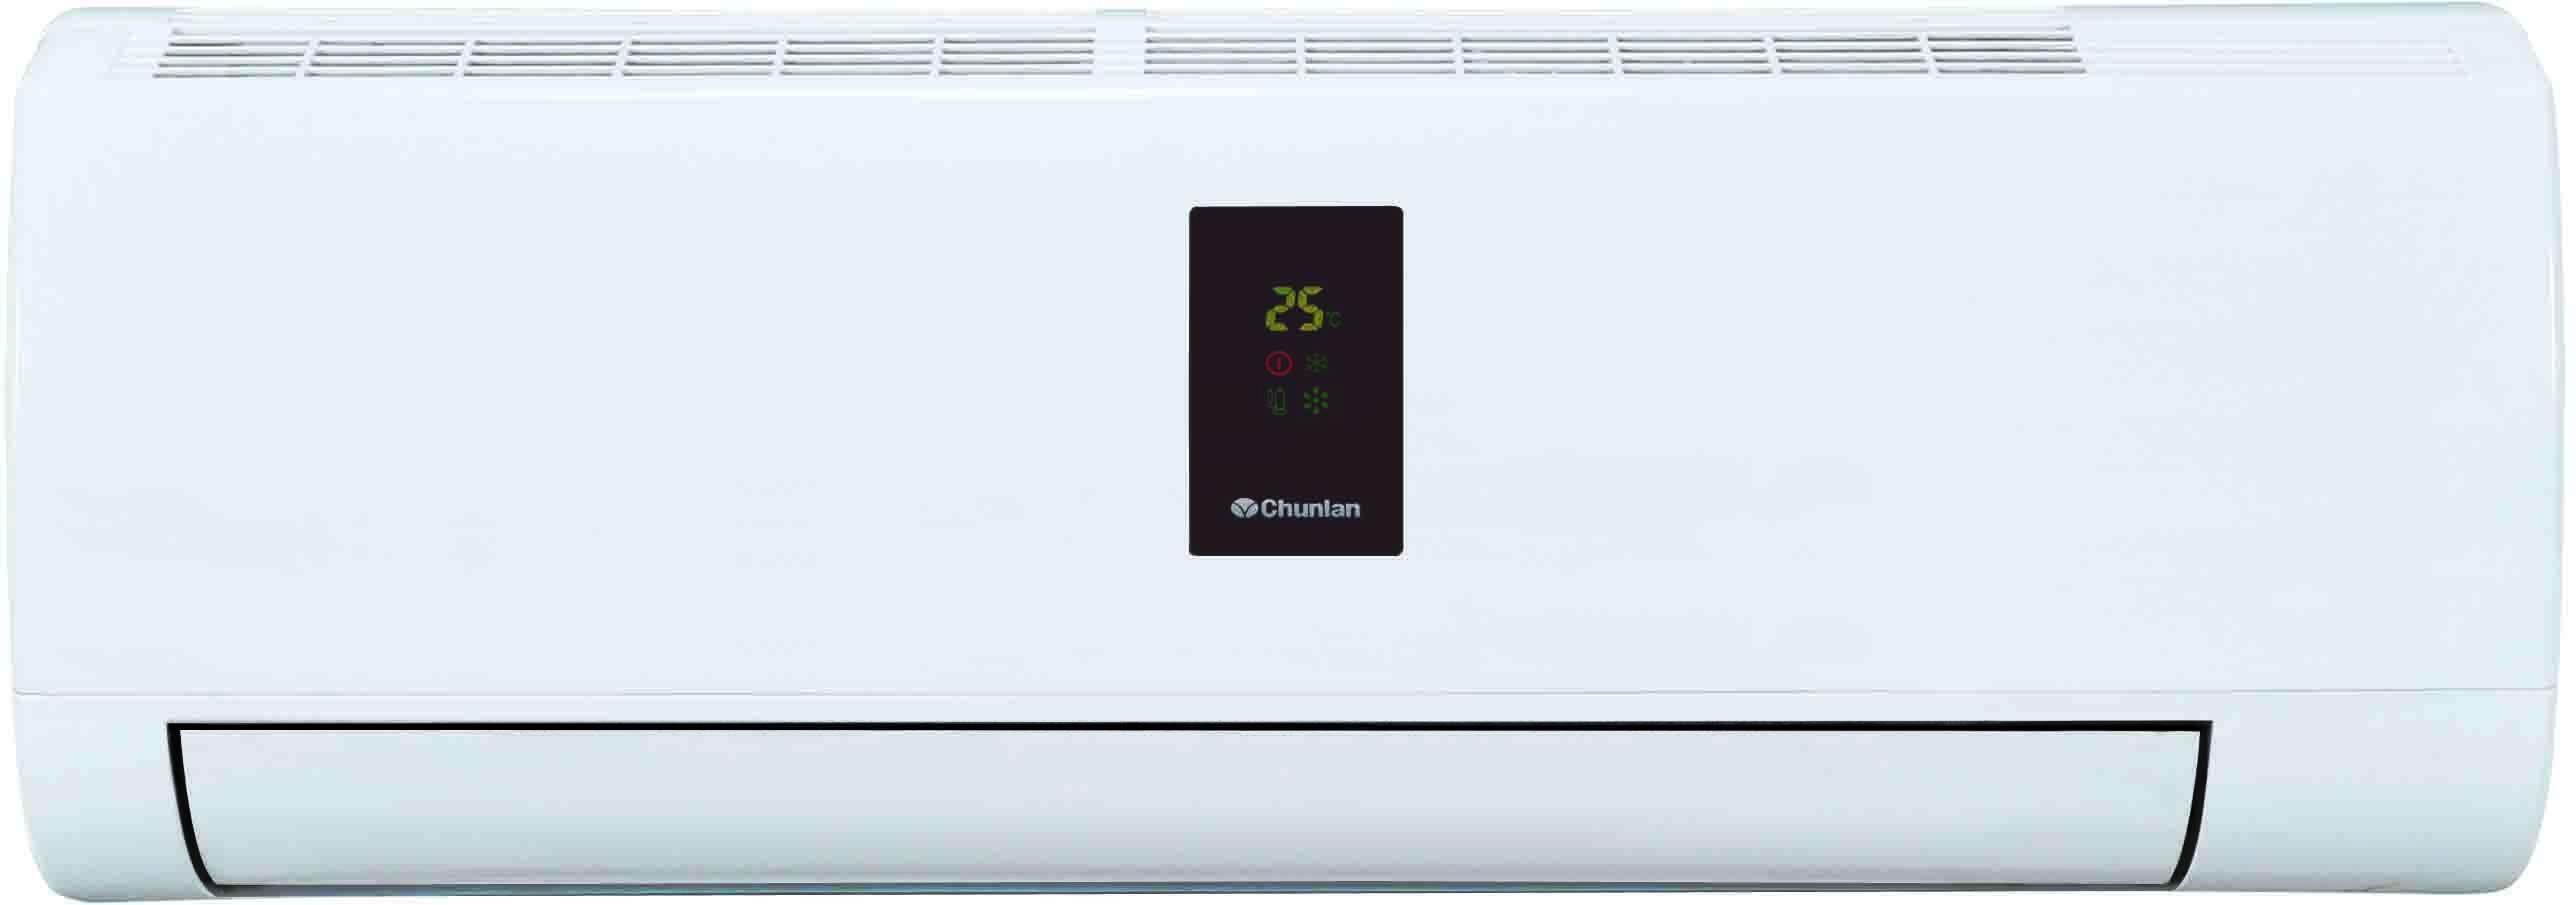 VJ3 Series Wall Split Air Conditioner